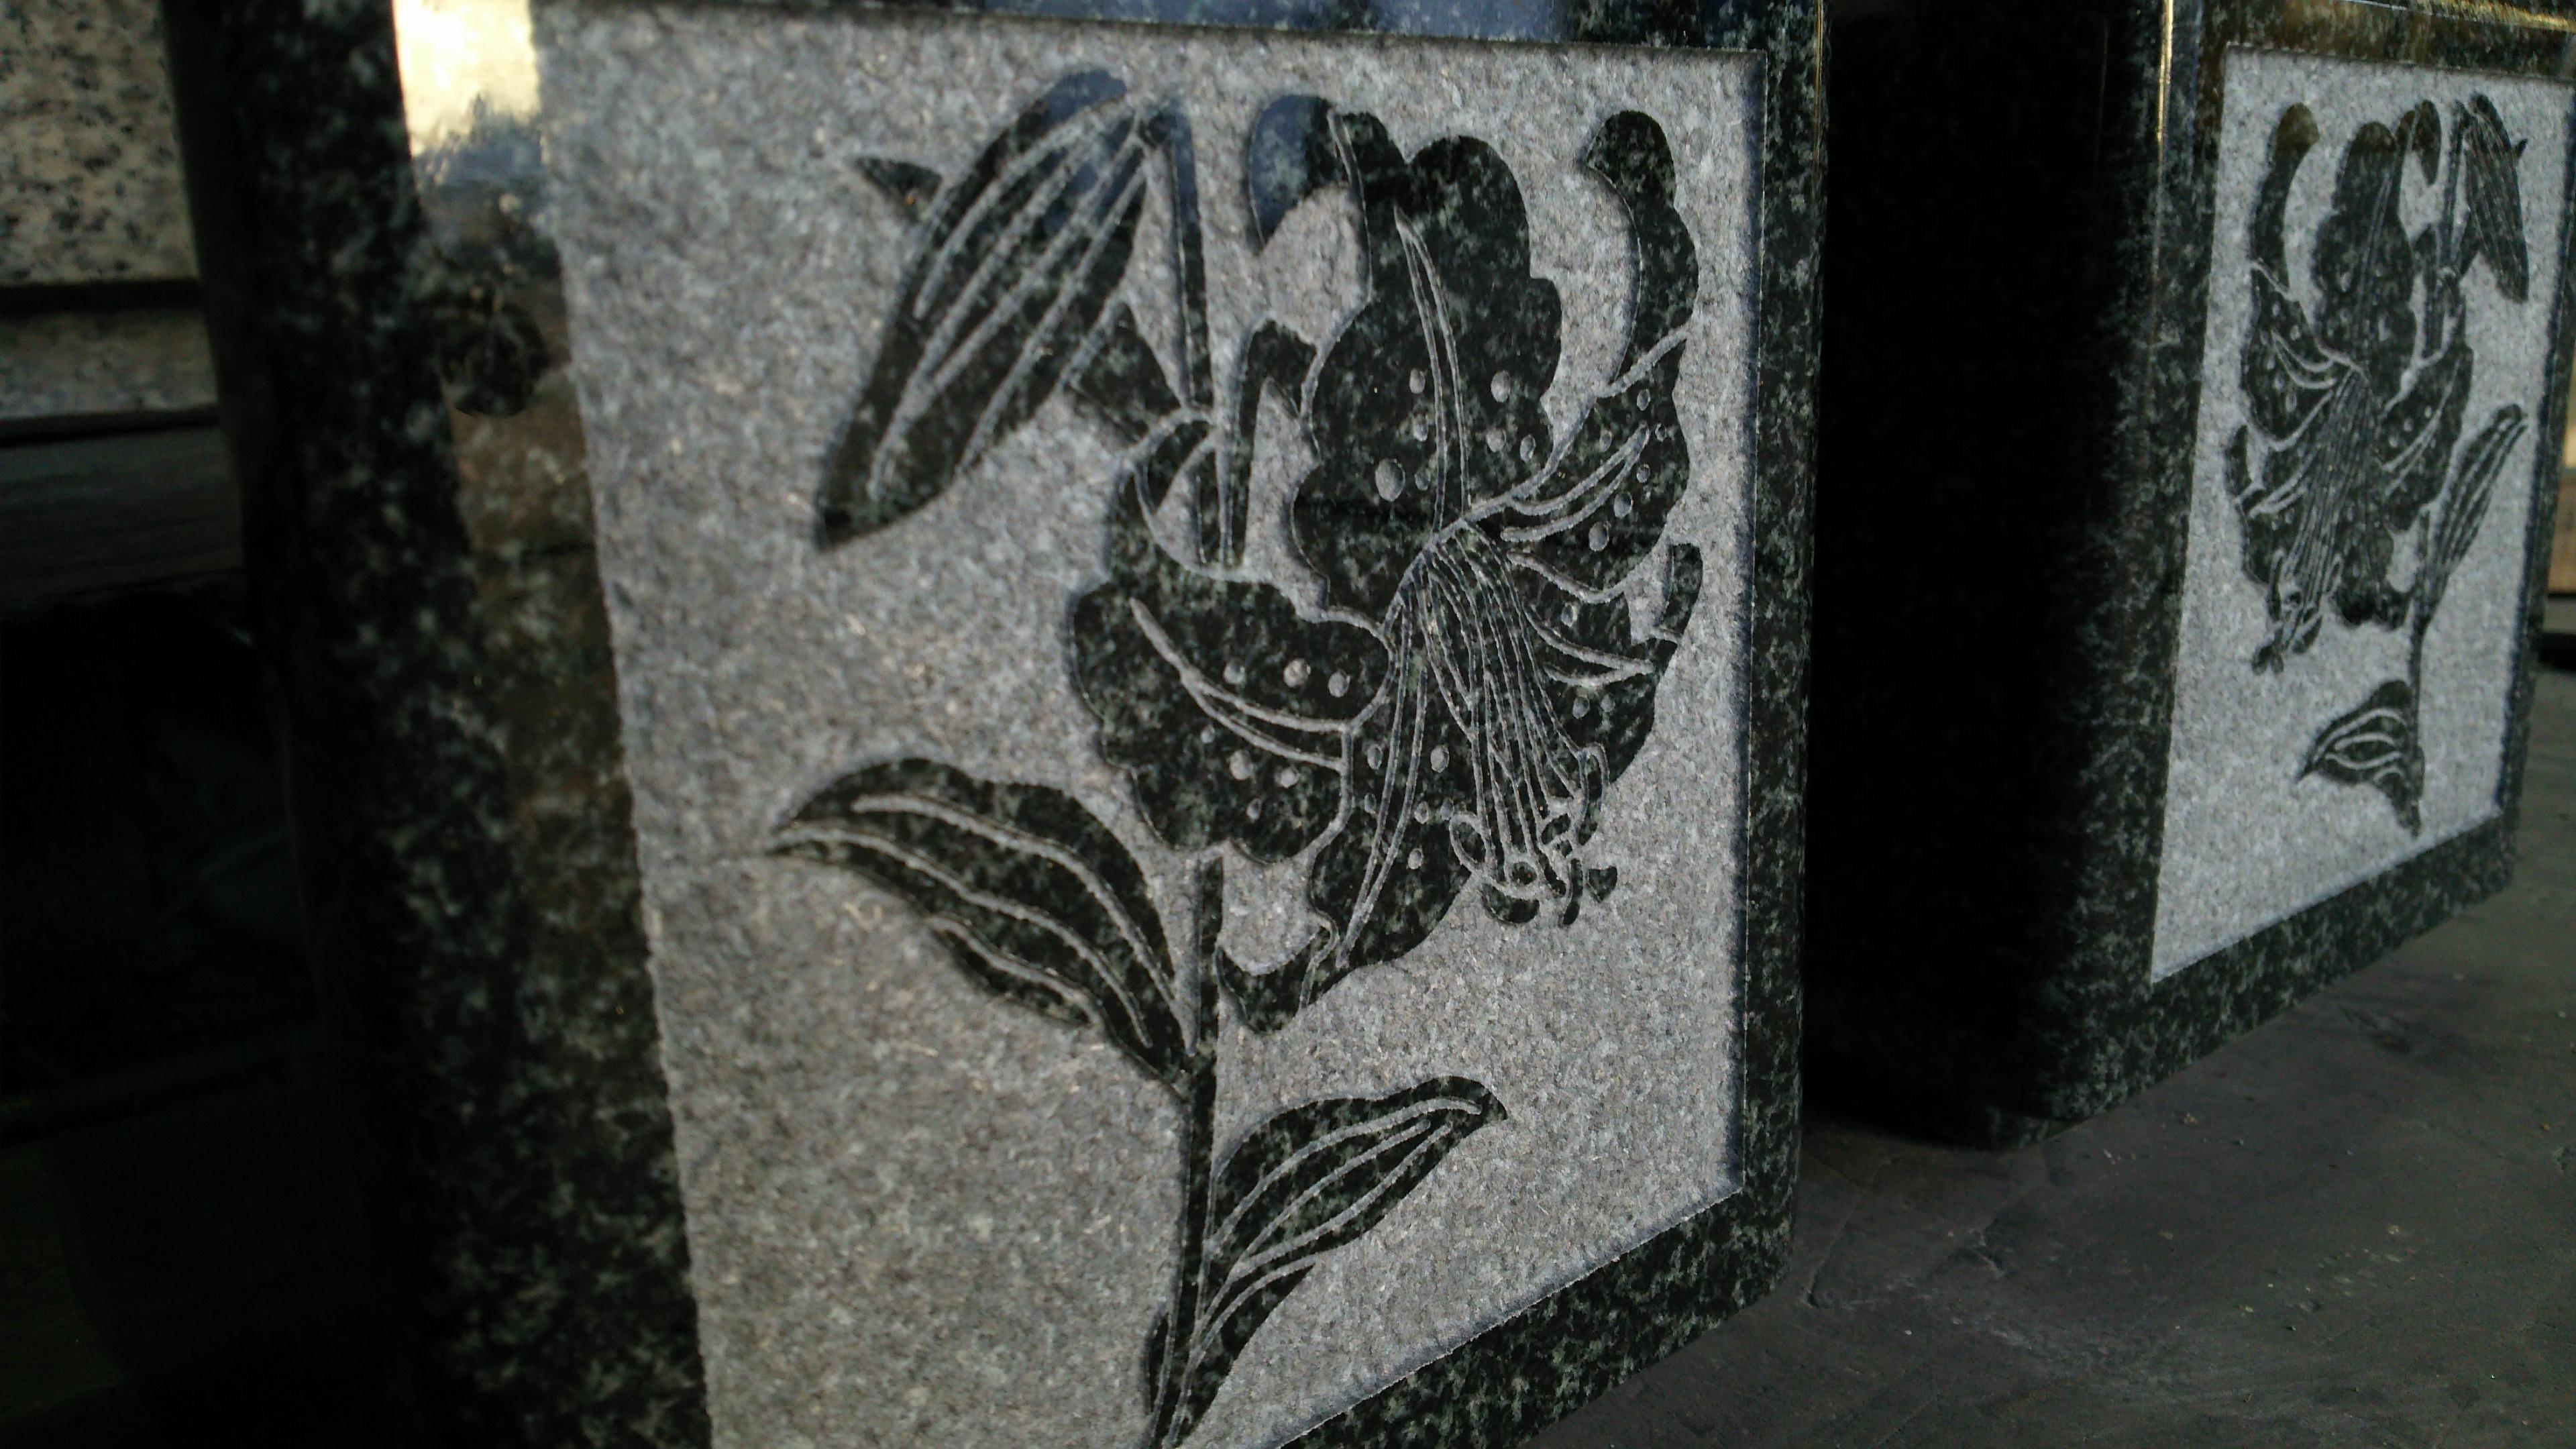 http://www.shonan-ls.co.jp/blog/stone/img/DSC_3611.JPG